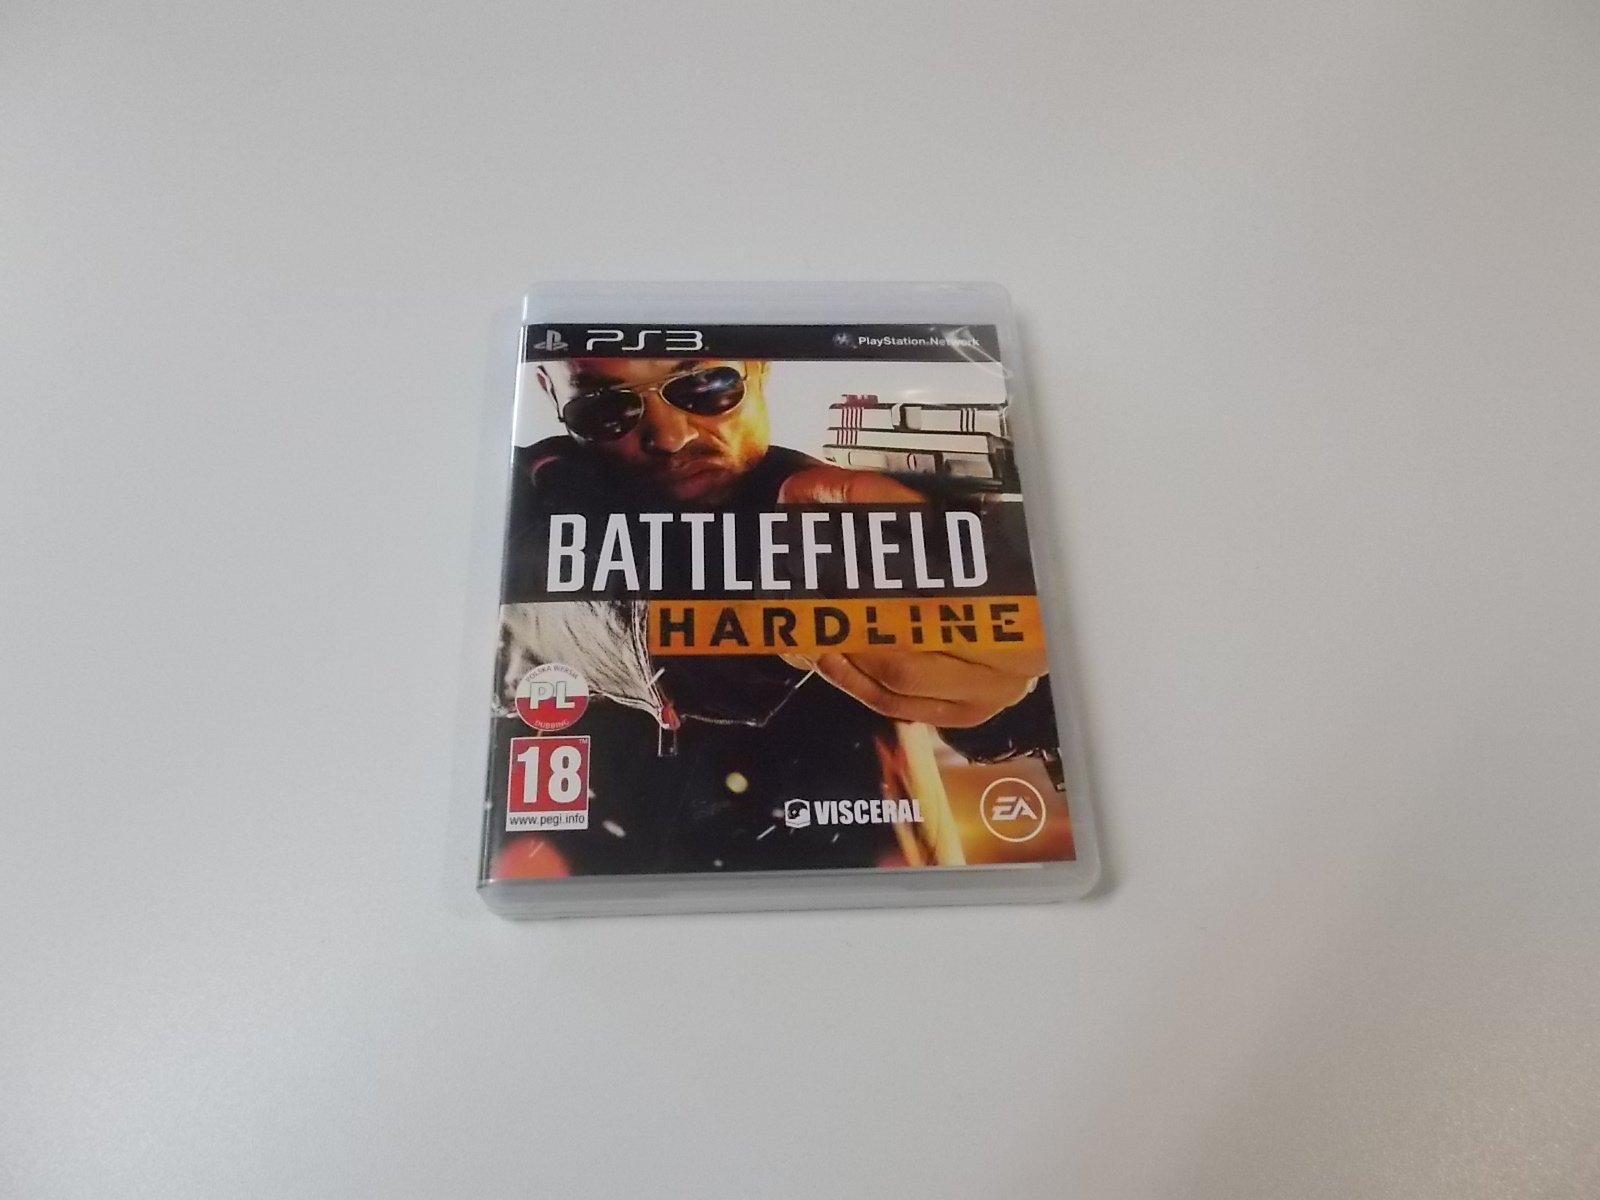 Battlefield Hardline - GRA Ps3 - Opole 0449